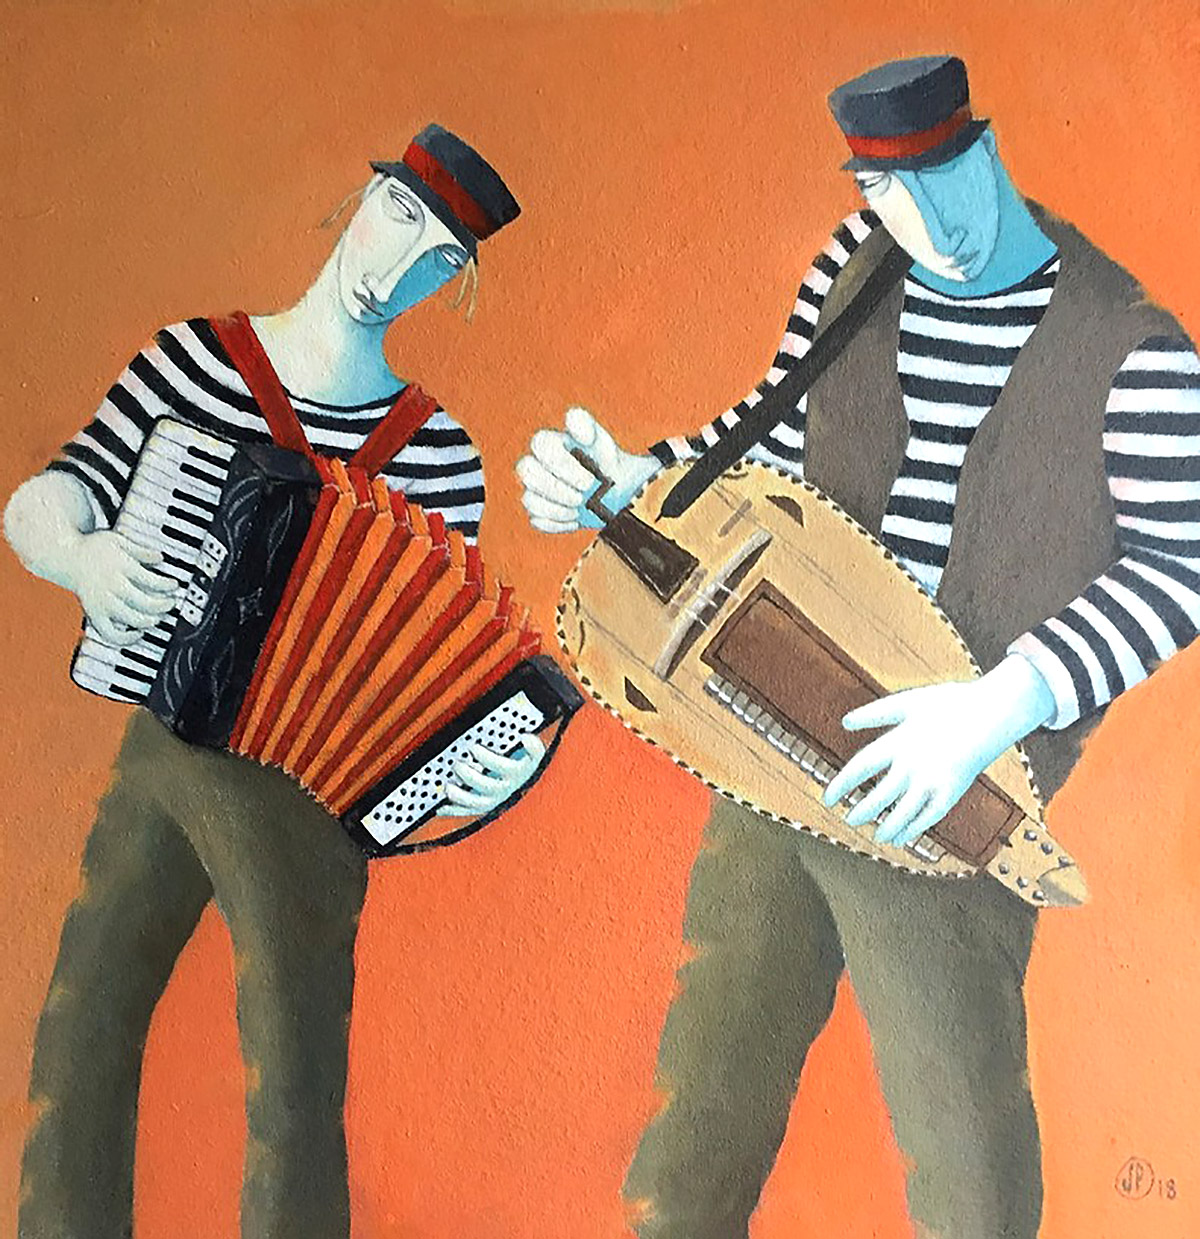 Joanna Powell, 'Accordion and Hurdy Gurdy', oil on canvas